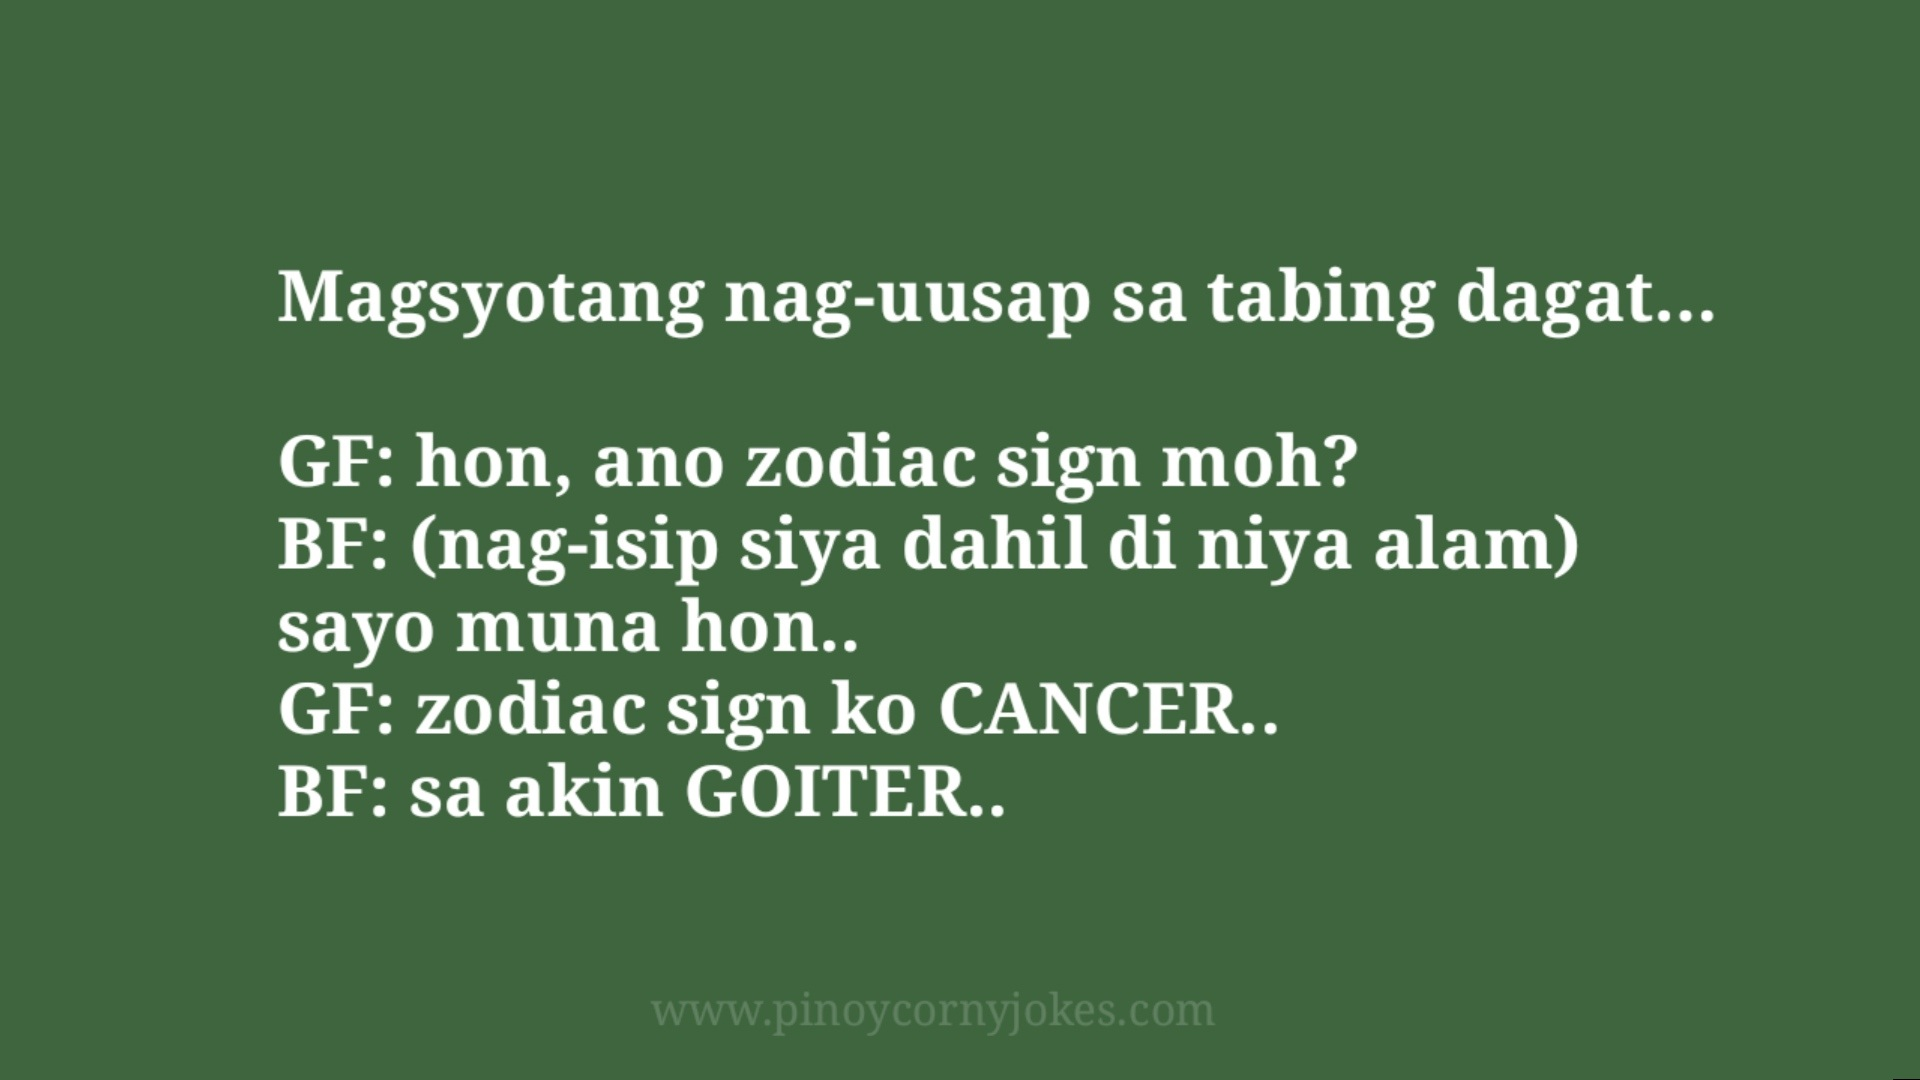 tabing dagat tagalog jokes mag bf gf